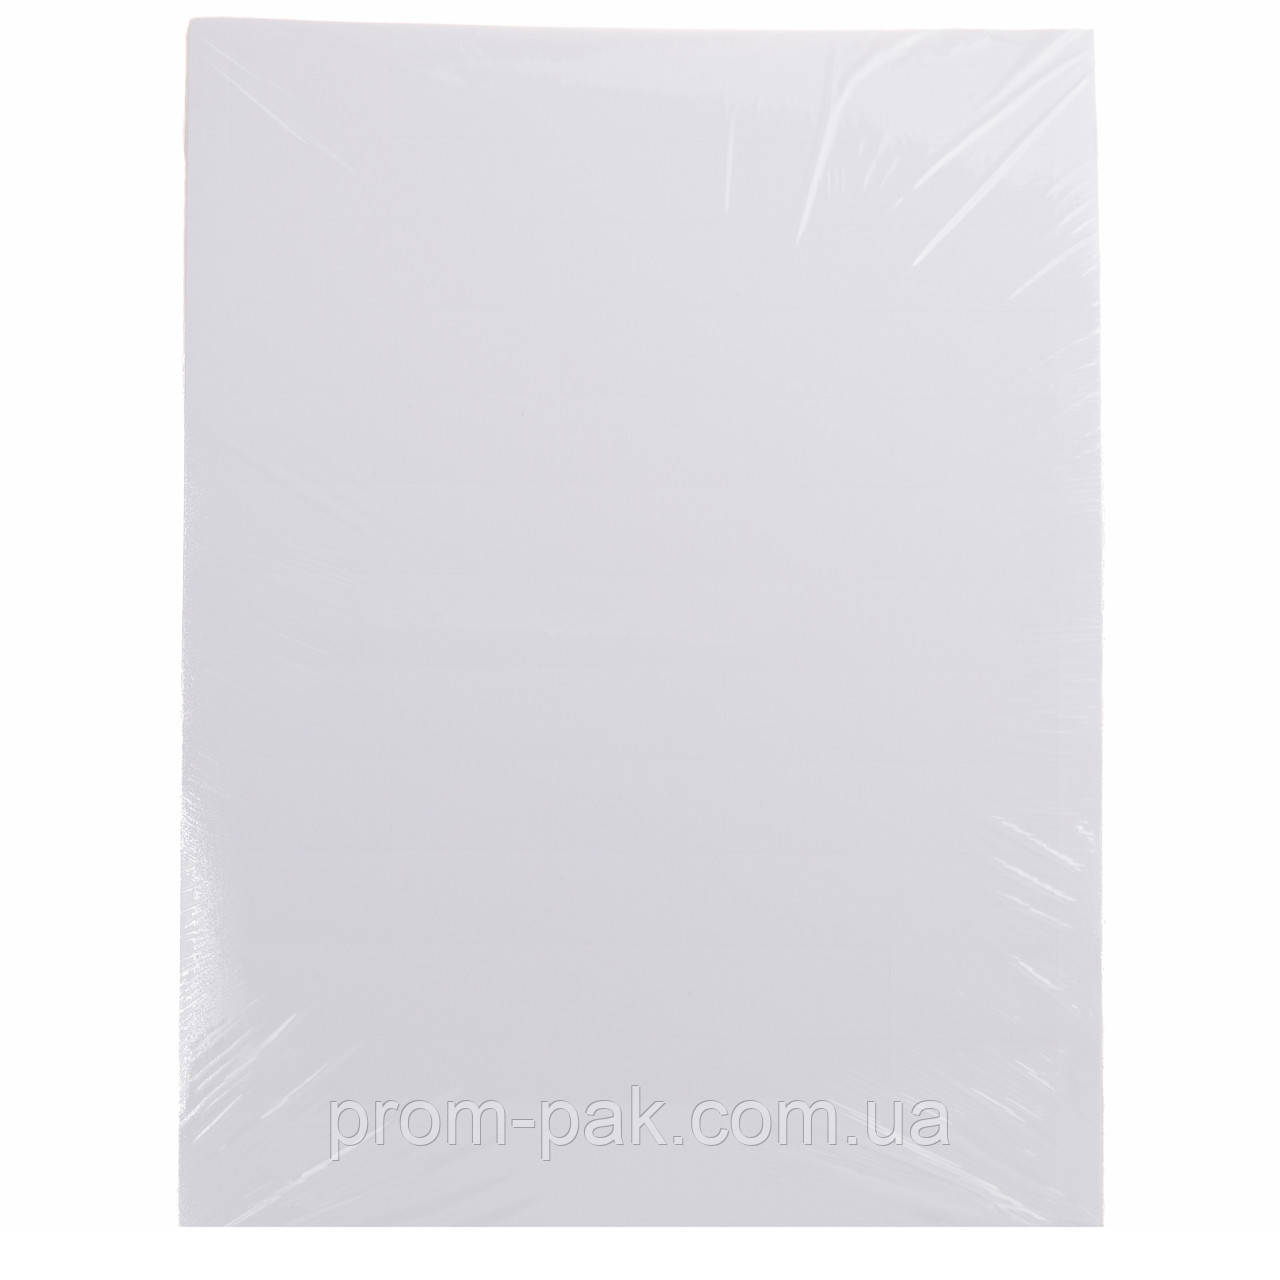 Етикетка А4 38,0*21,3 (65) 100арк Crystal Premium